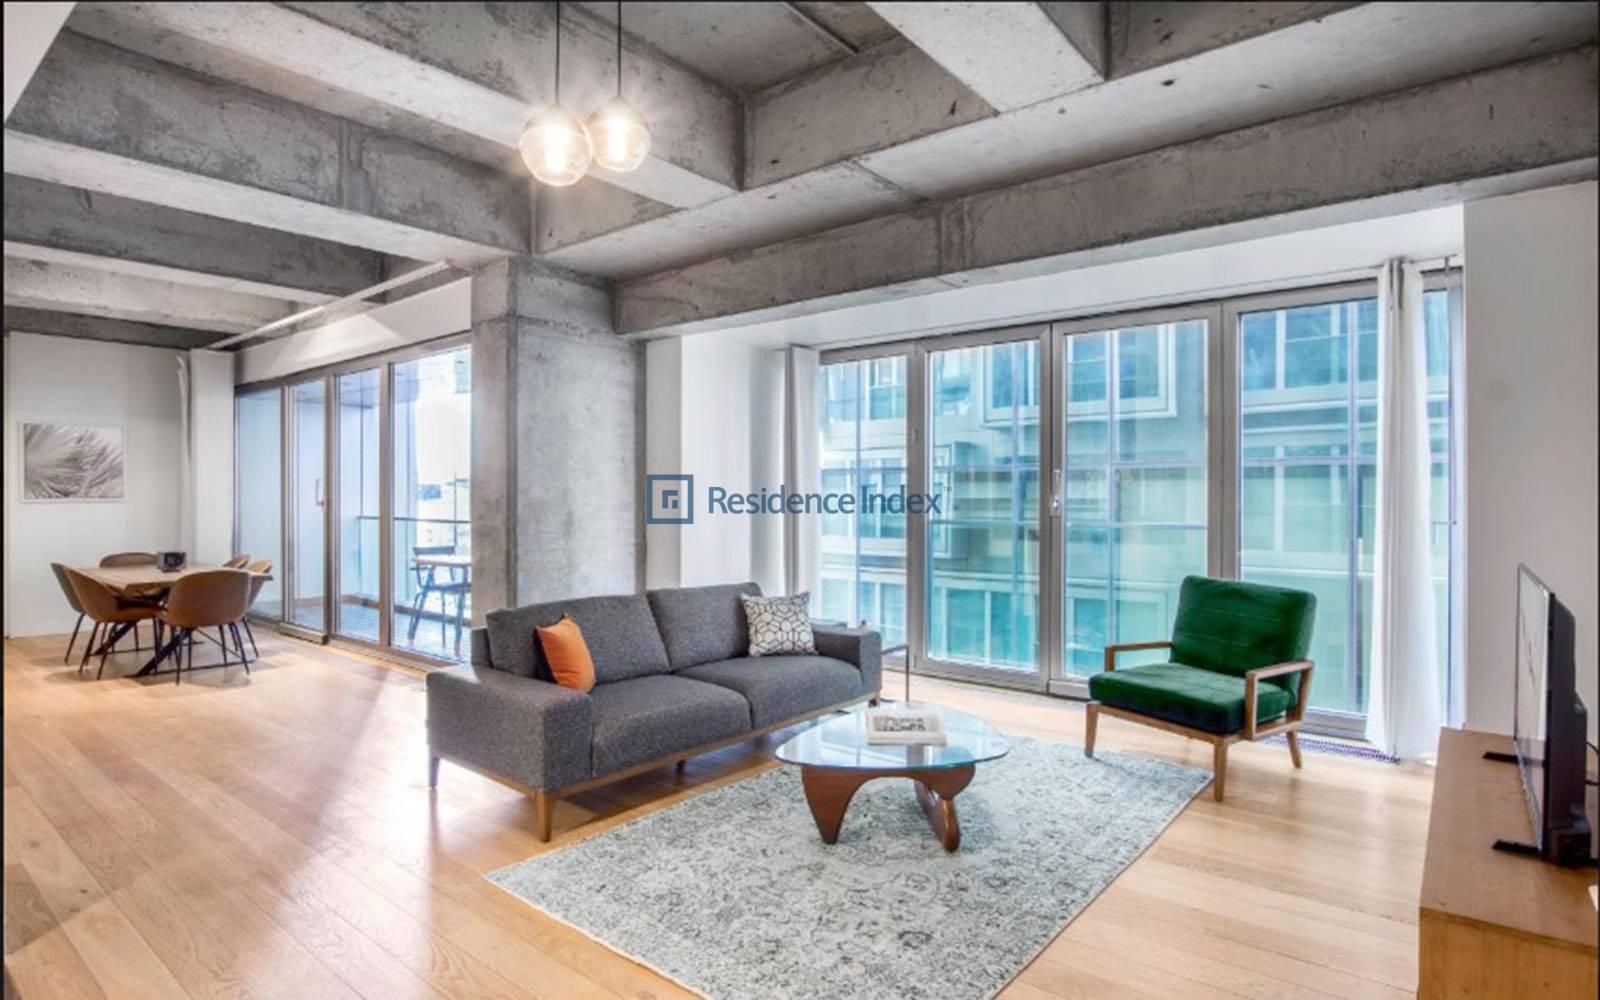 Levent Loft - Levent Loft Luxury Furnished 1 + 1 Apartment